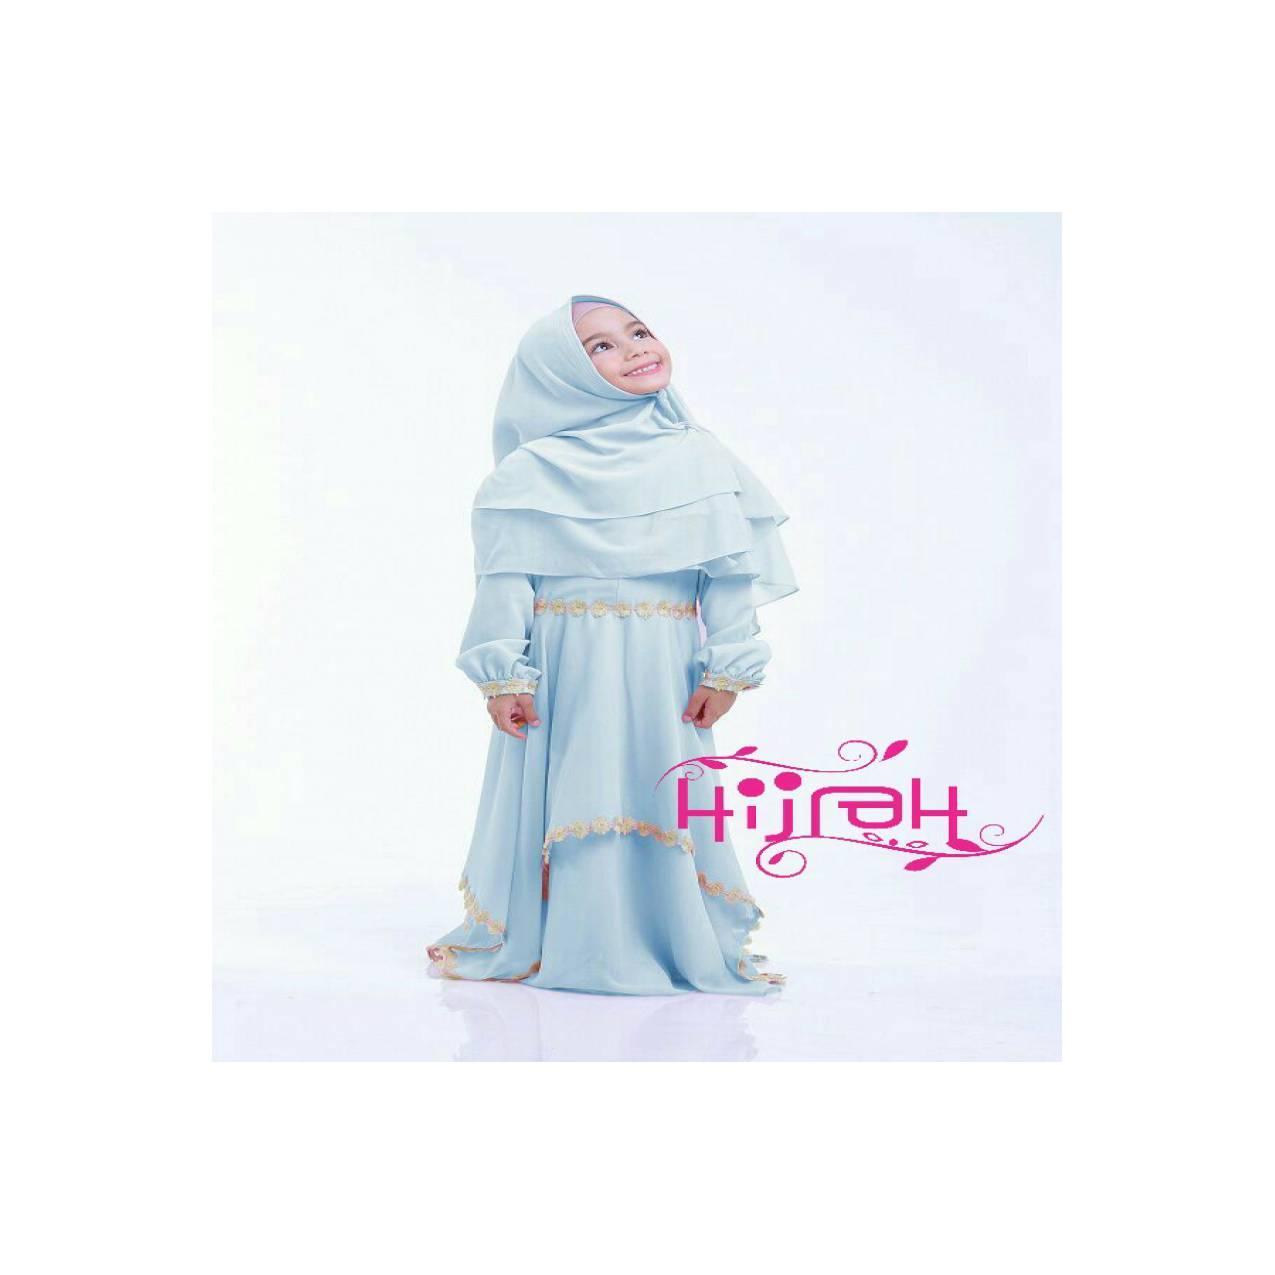 Gamis Bilqis kids BabyPink ori by Hijrah Premium Quality